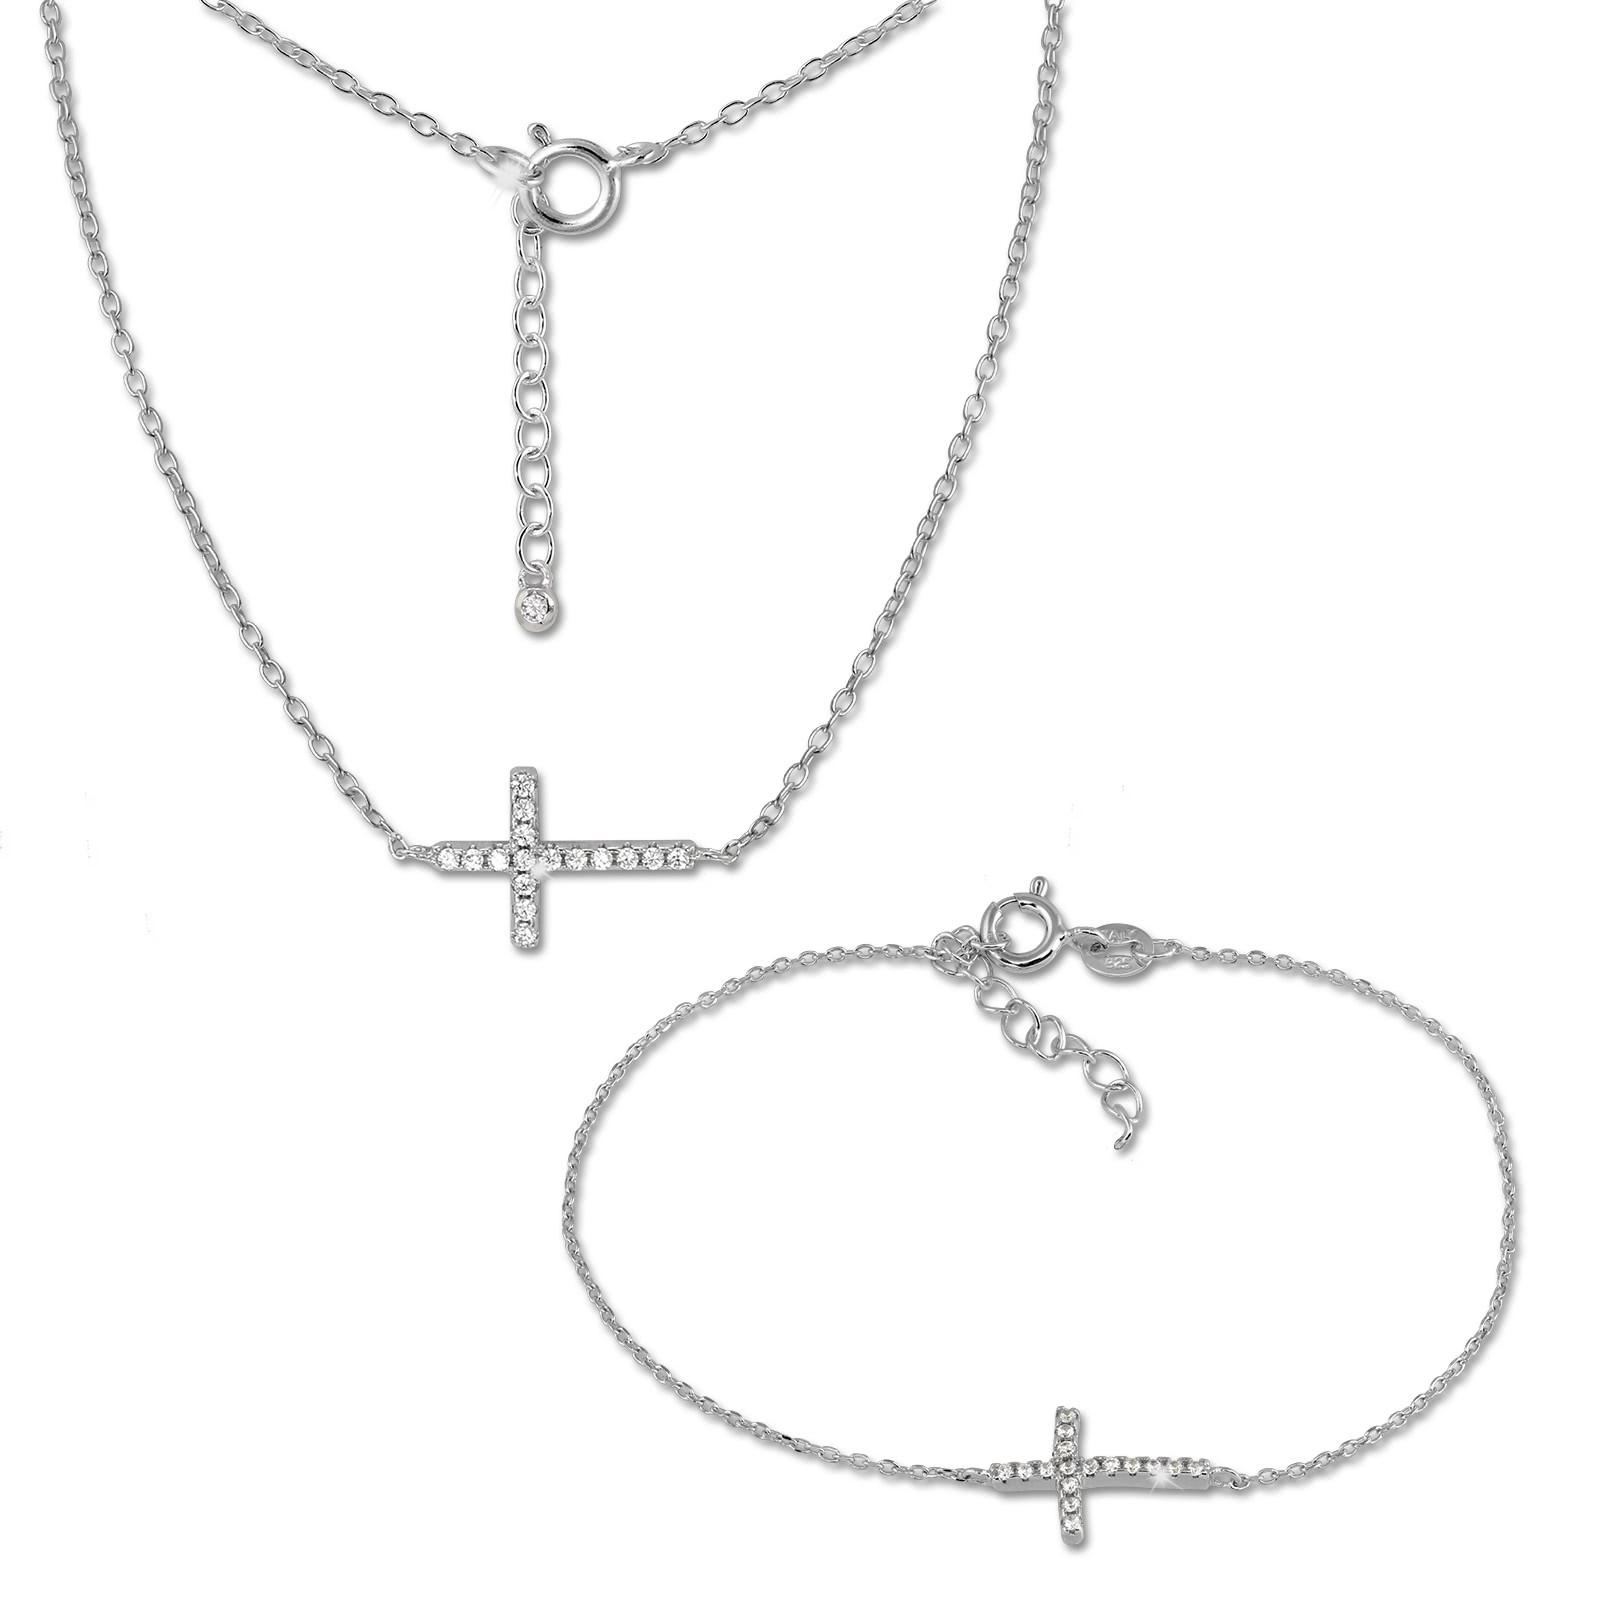 SilberDream Schmuckset Kreuz Zirkonia Halskette & Armband 925 Silber GSS412W